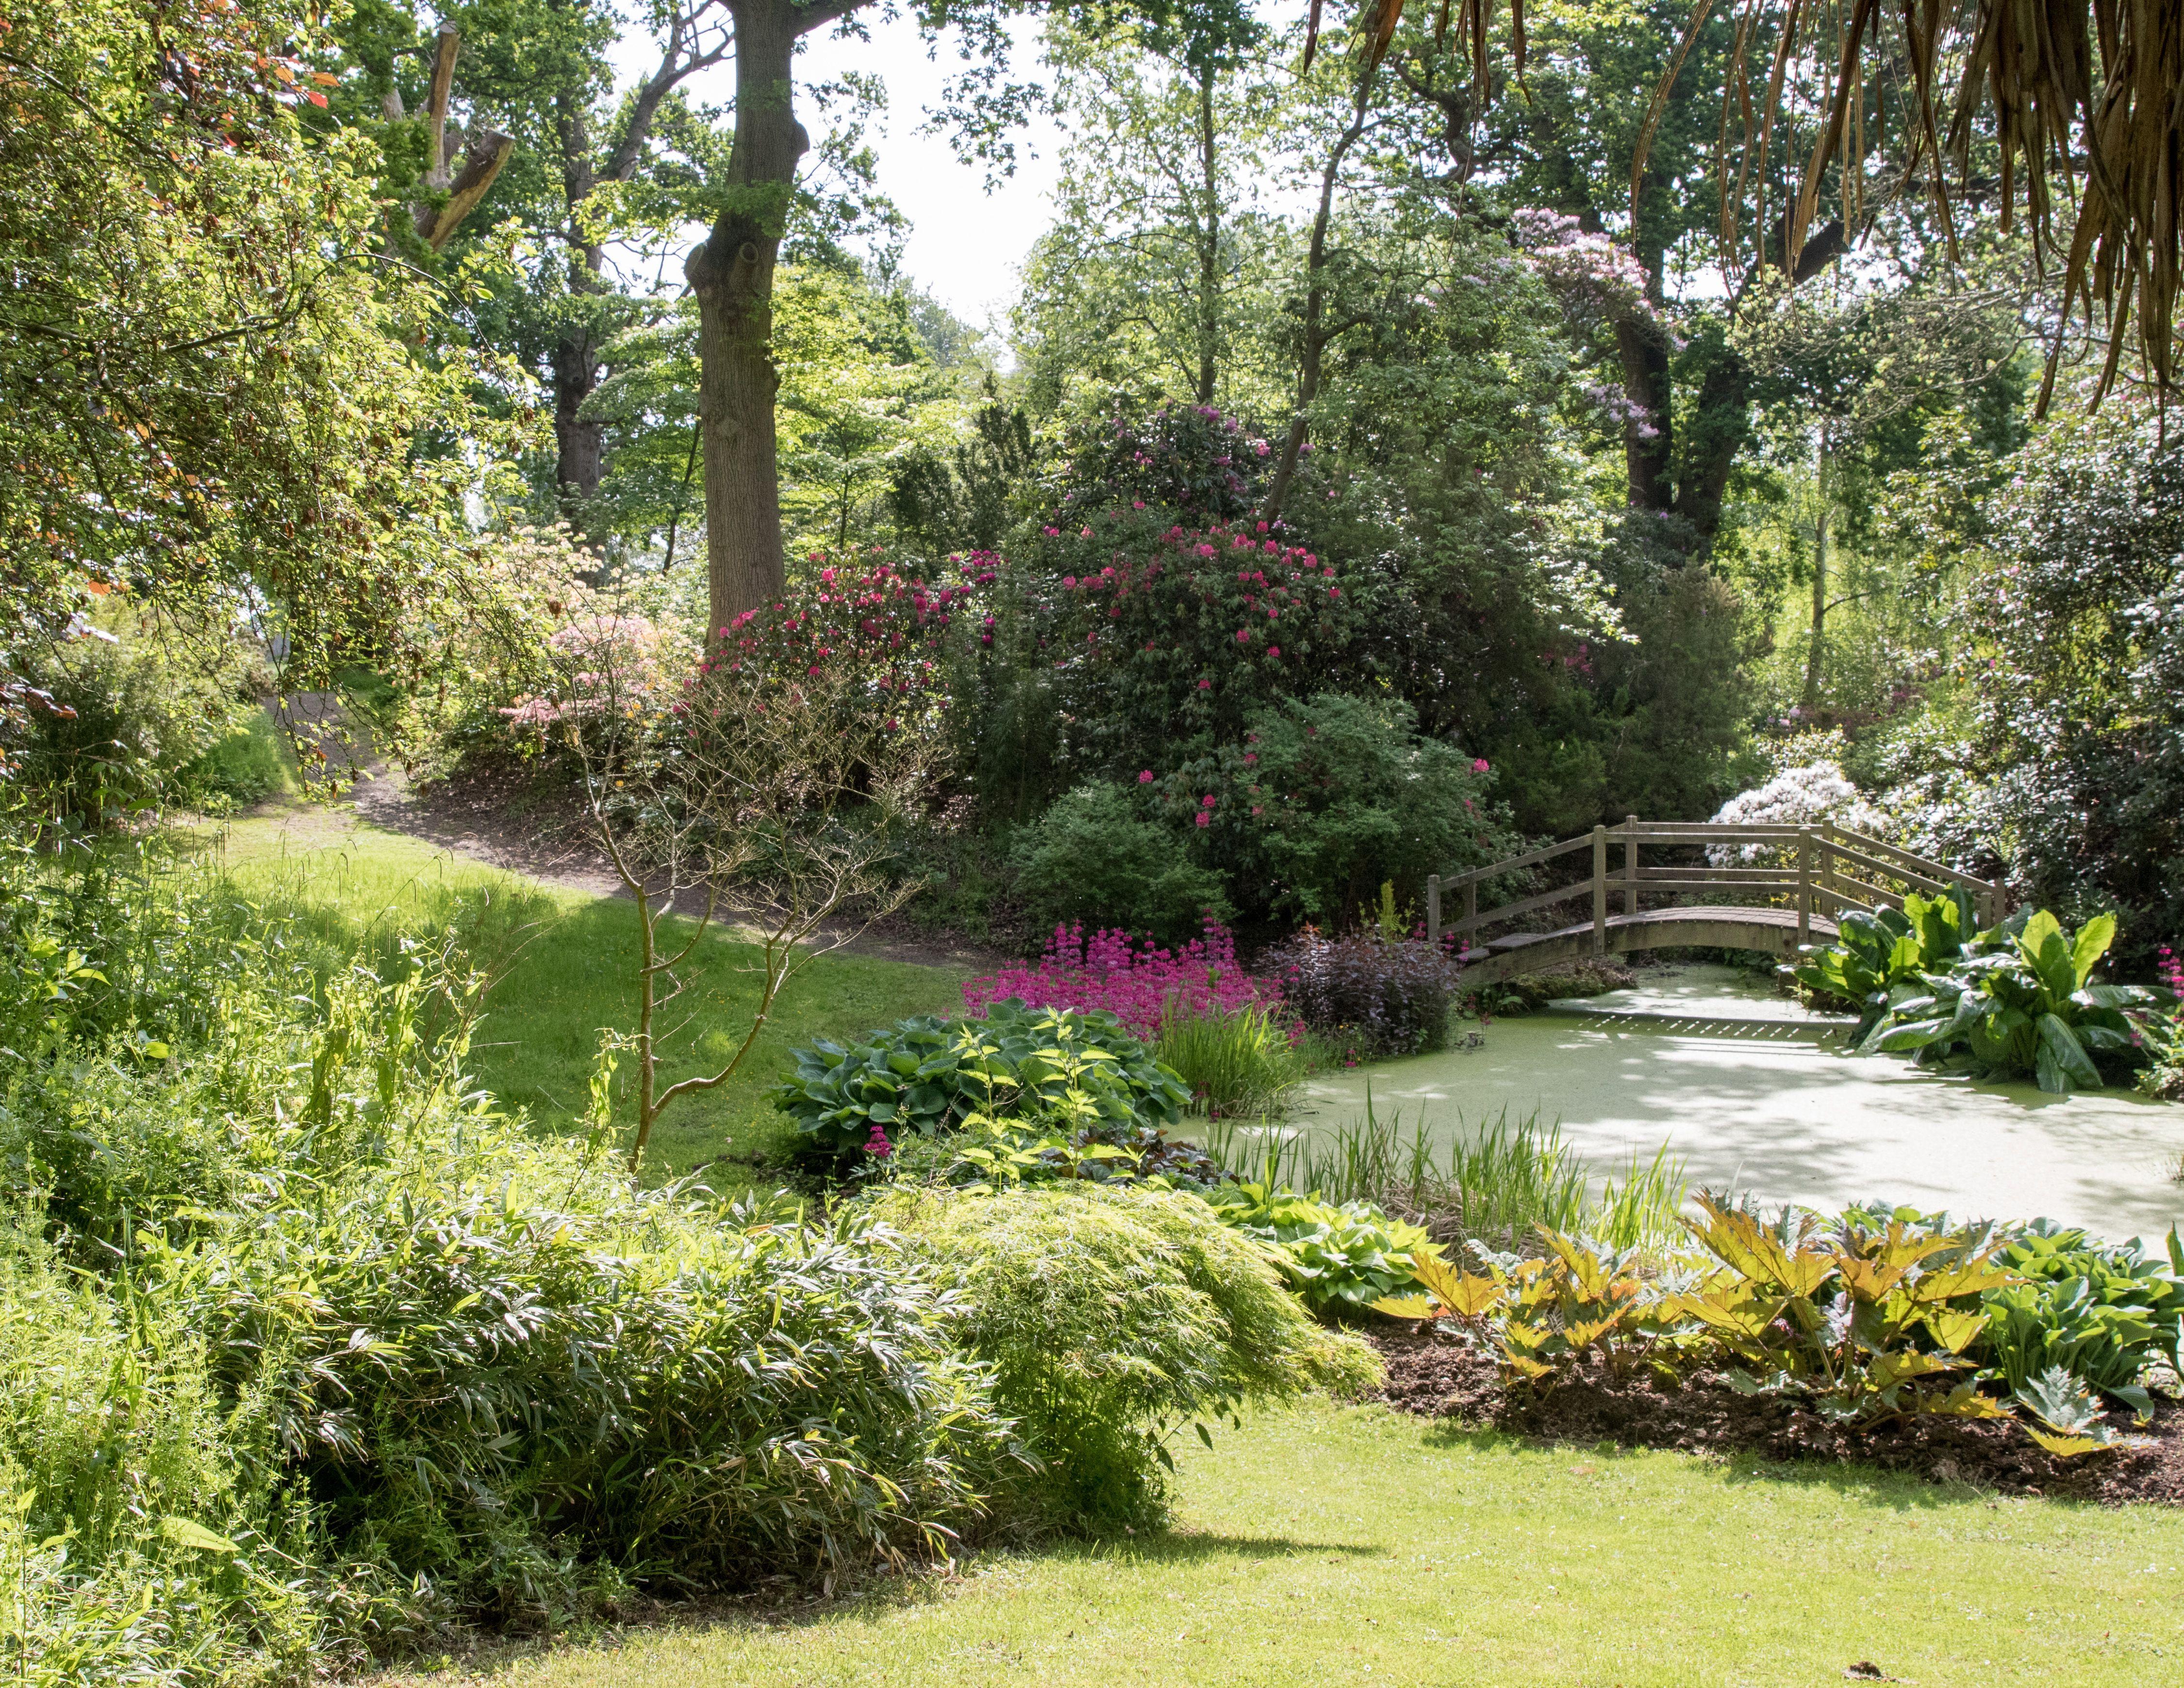 Hole Park, Rolvenden, Cranbrook, Kent, England